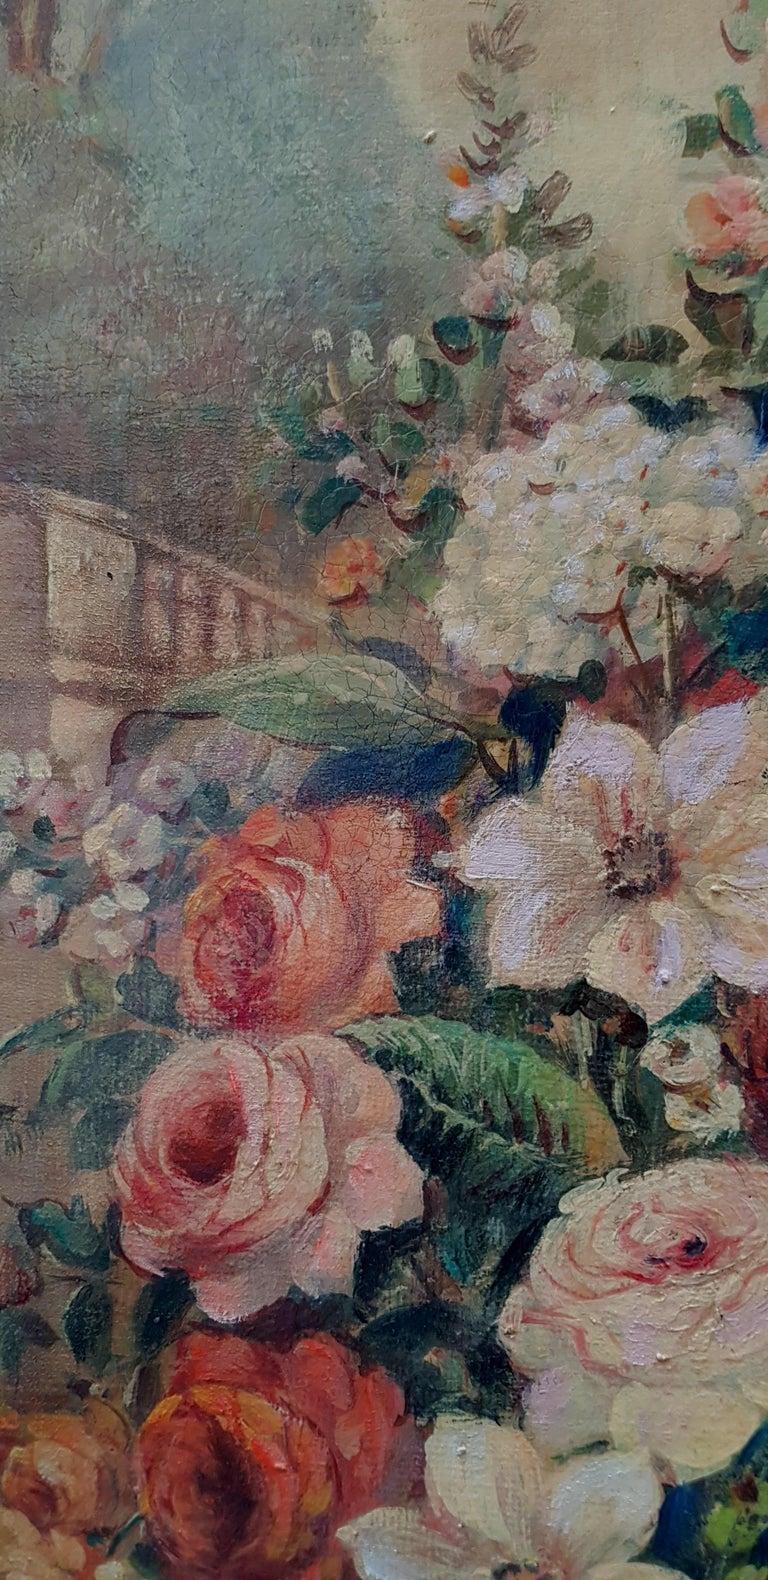 FLOWERS- In the Manner of  Gasparo Lopez dei Fiori - Neapolitan School - Paint - Brown Still-Life Painting by Vittorio Landi